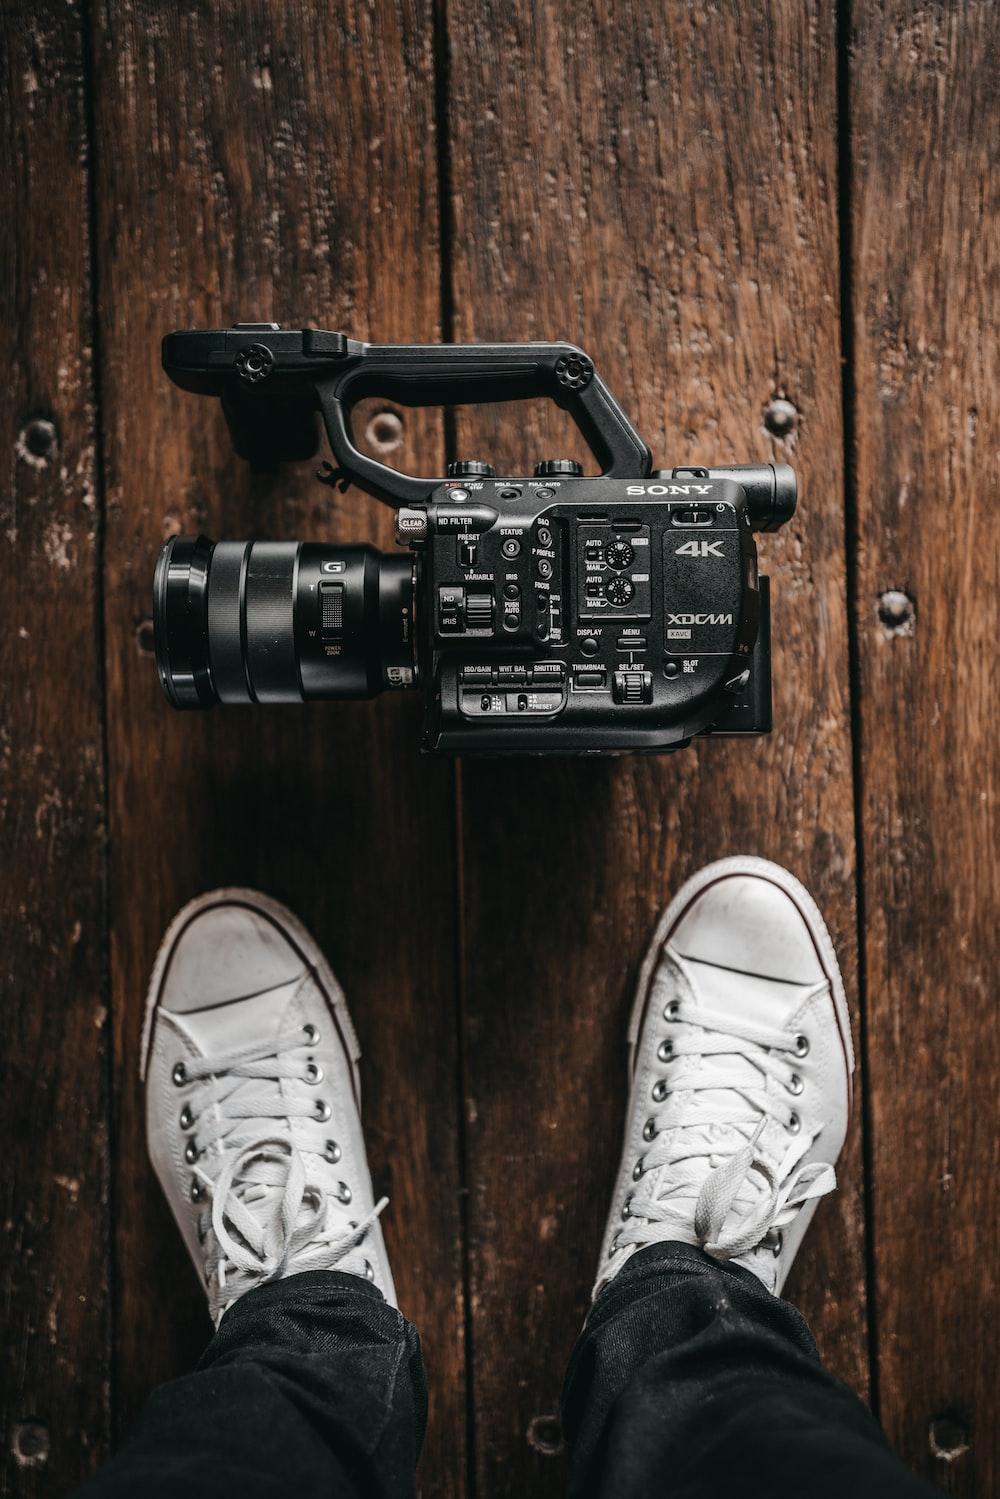 black Sony videocamera on floor